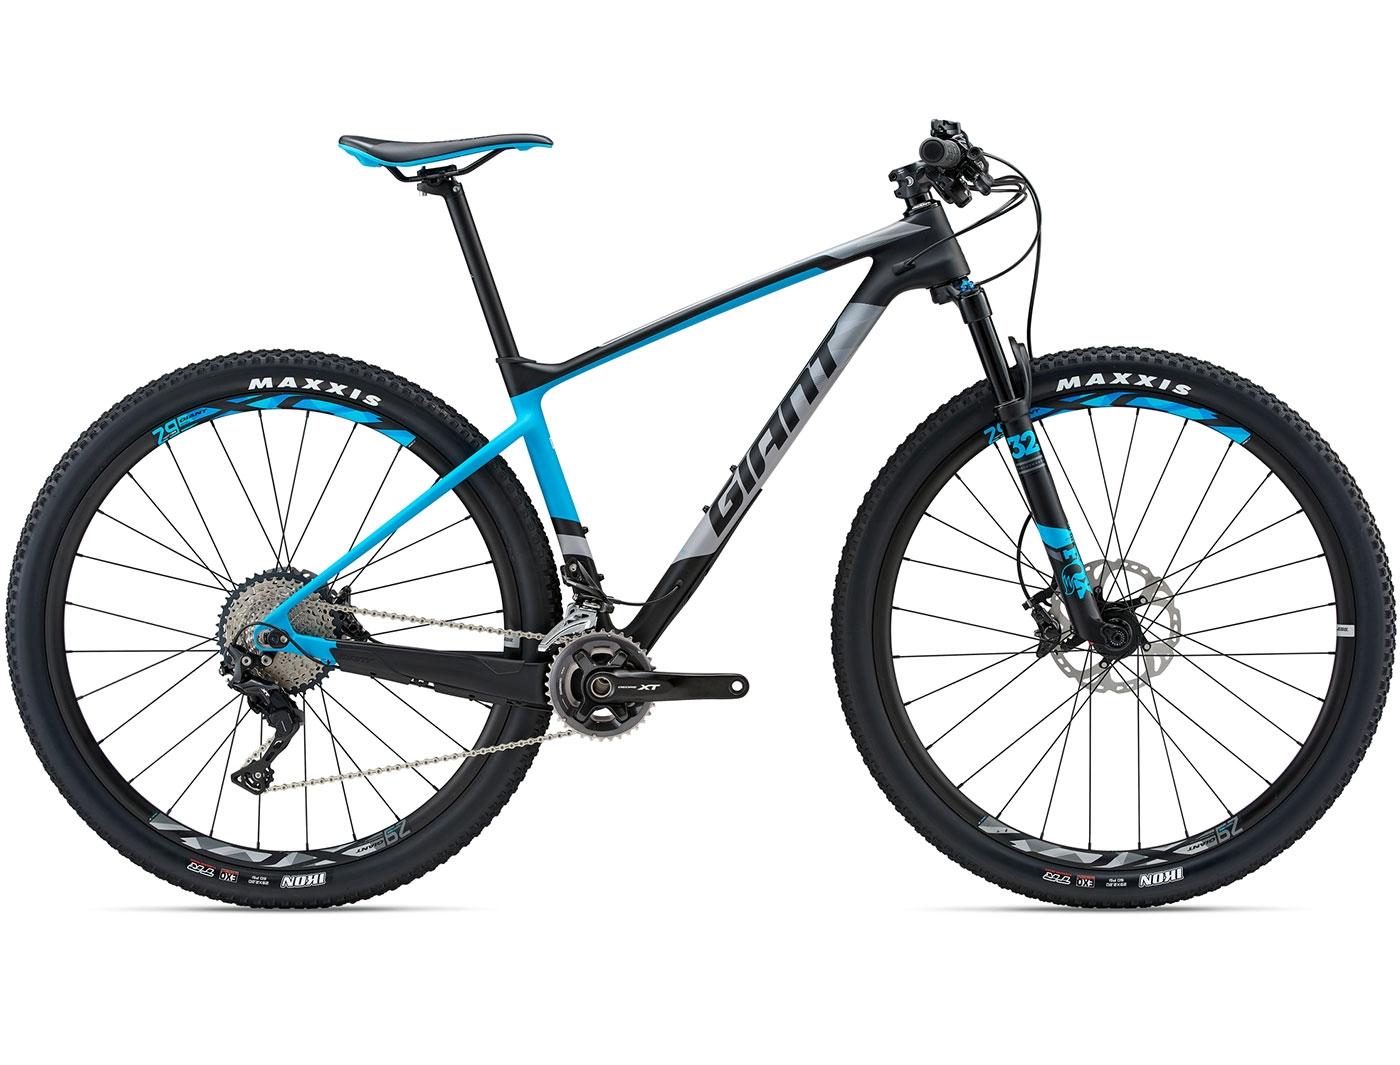 Велосипед Giant XTC Advanced 29er 1.5 GE (2018)